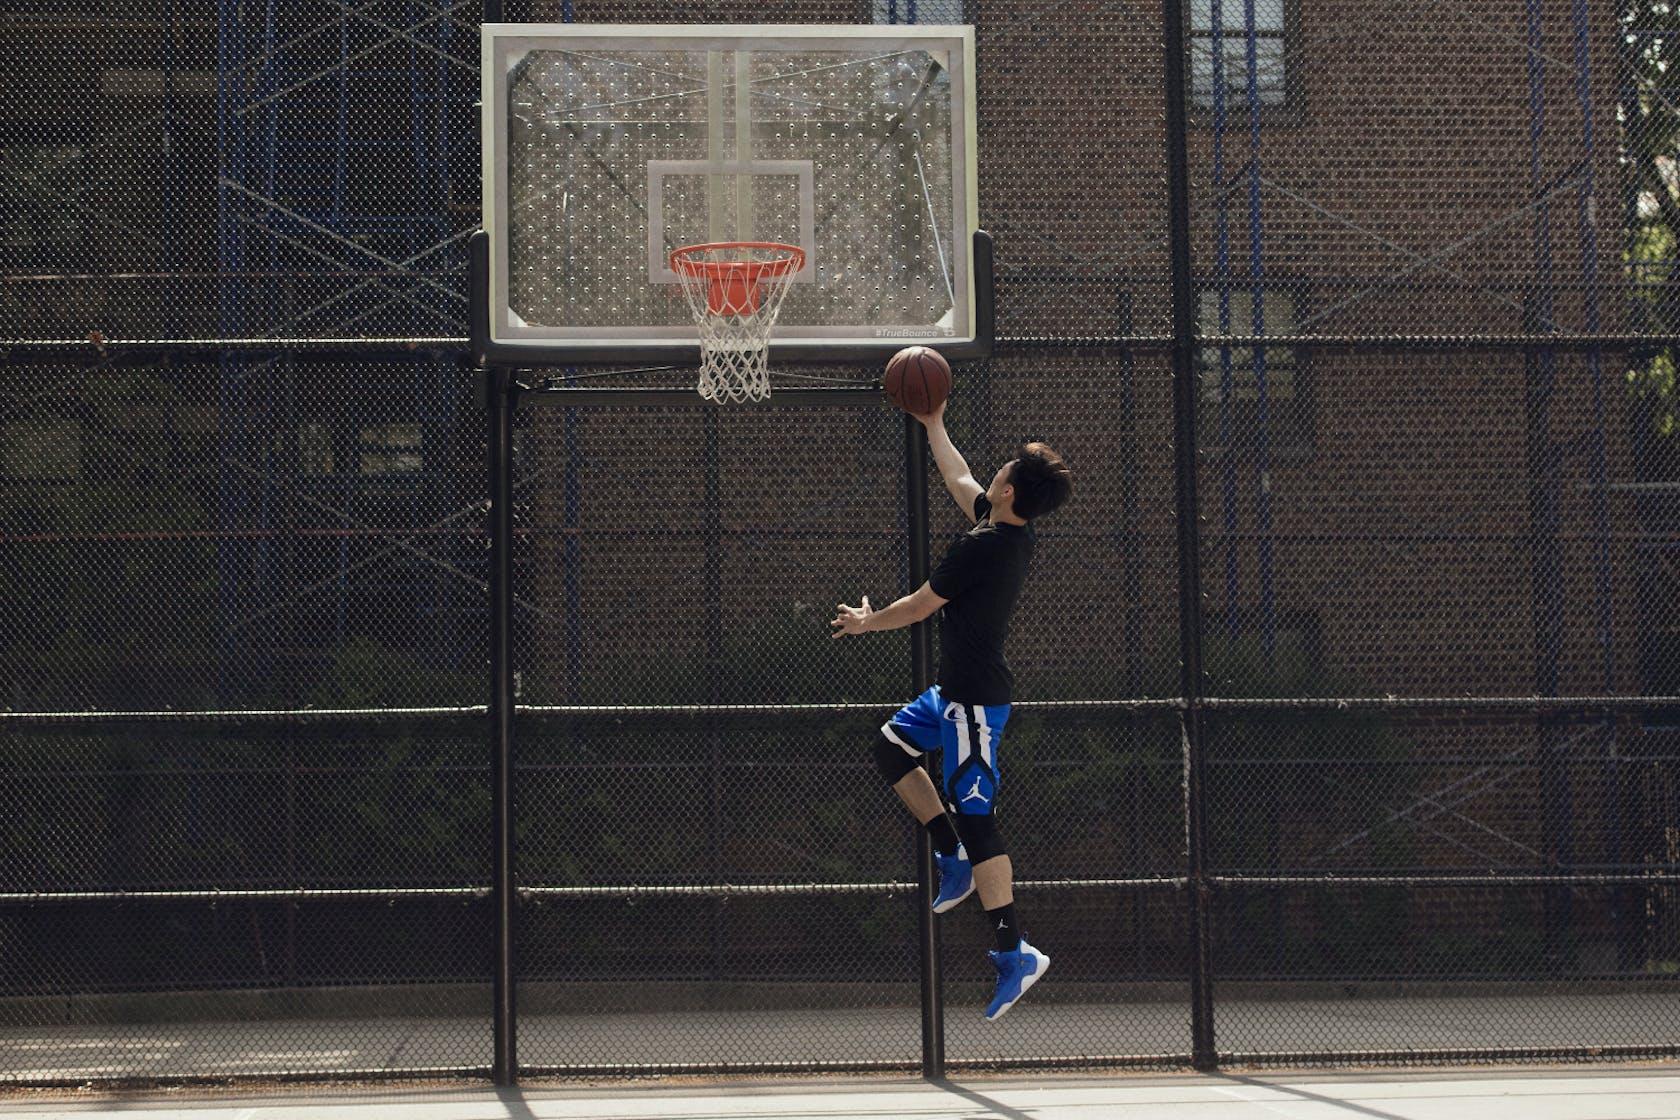 Nike Onlineshop Basketball